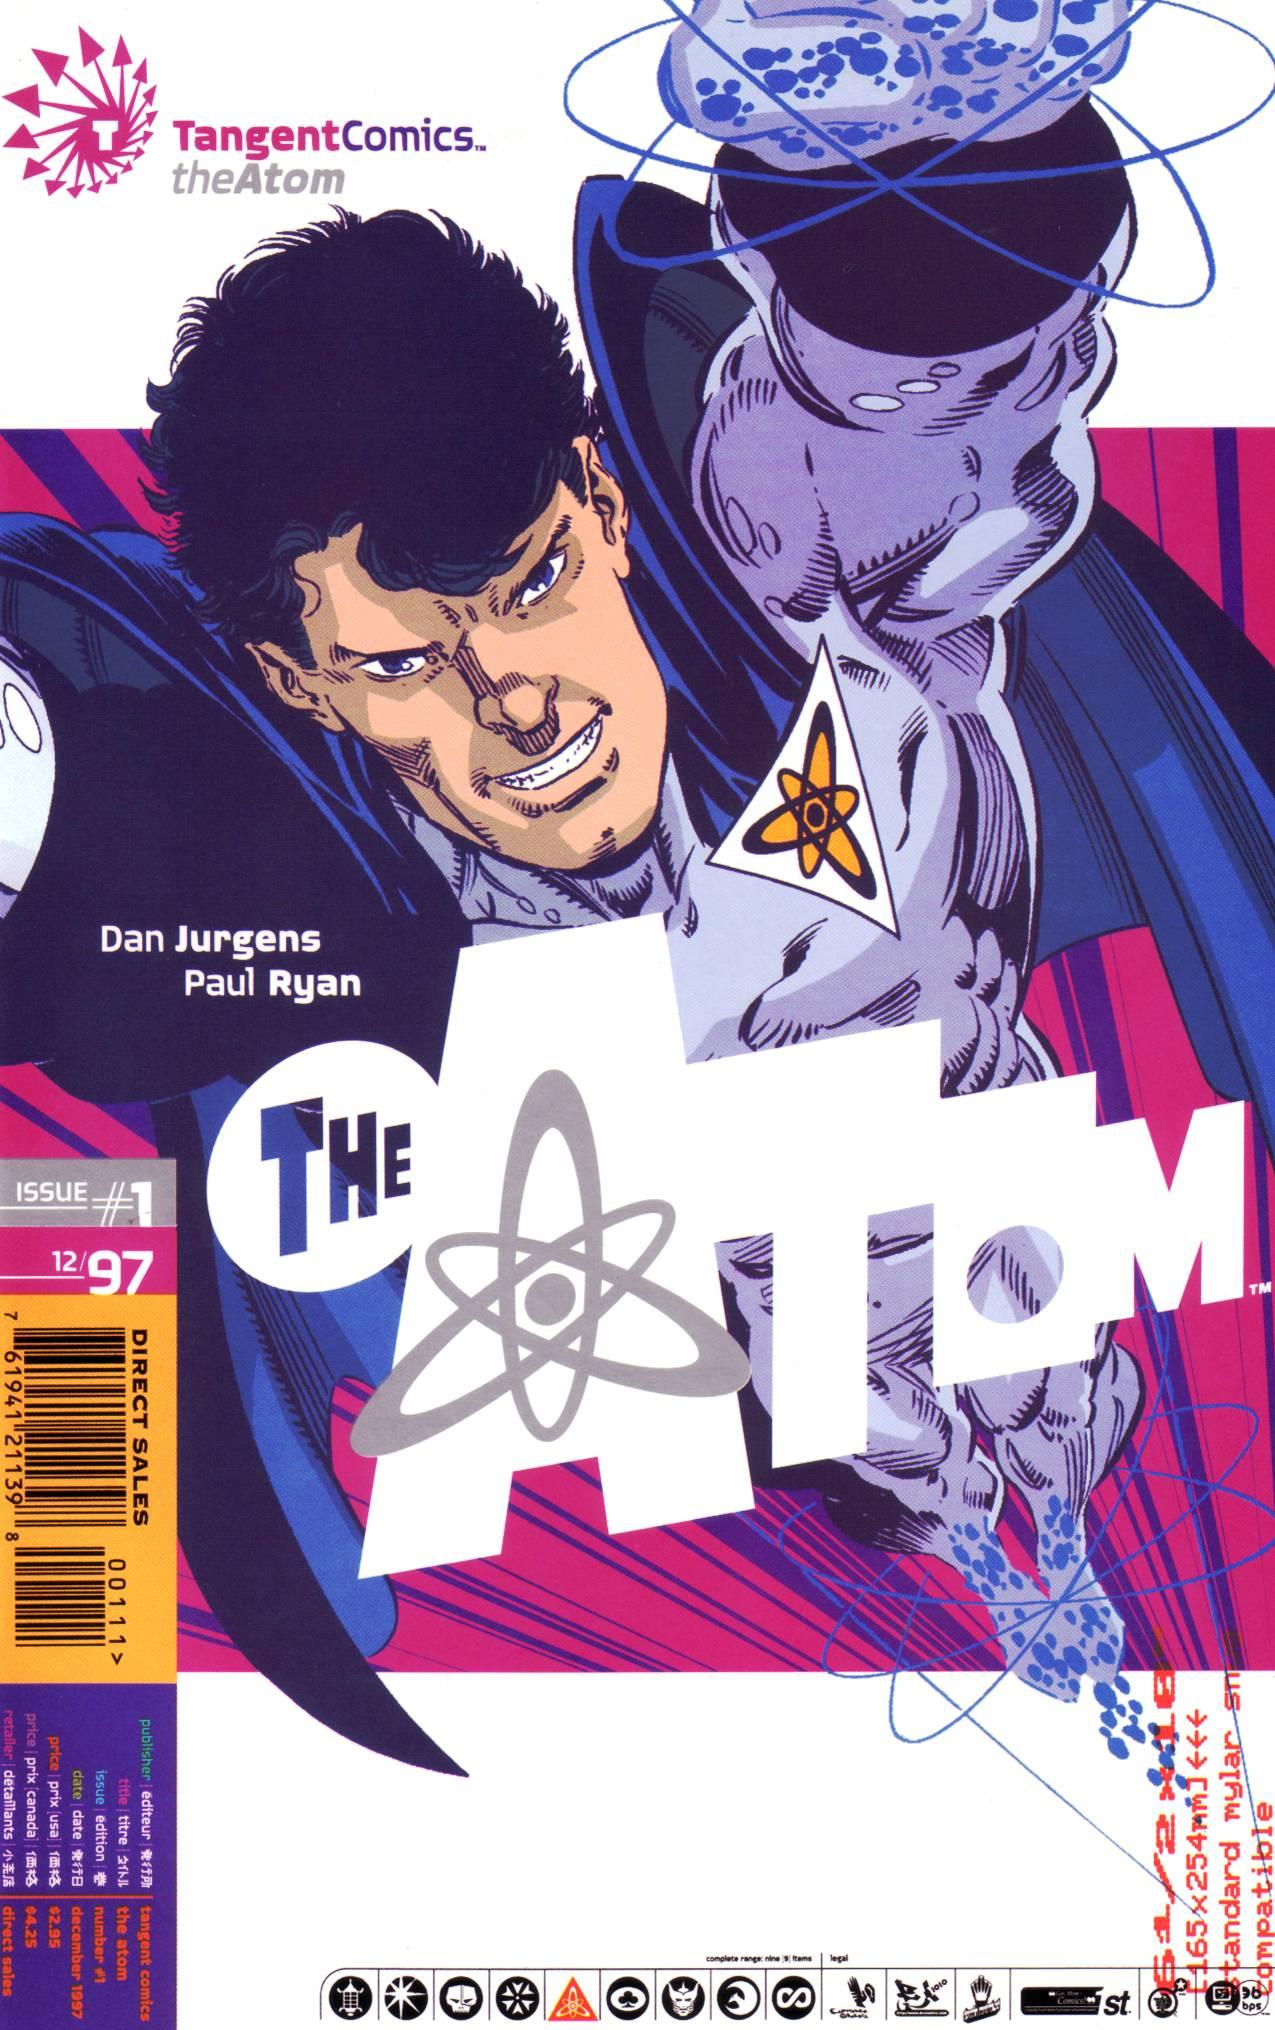 Read online Tangent Comics/ The Atom comic -  Issue # Full - 1